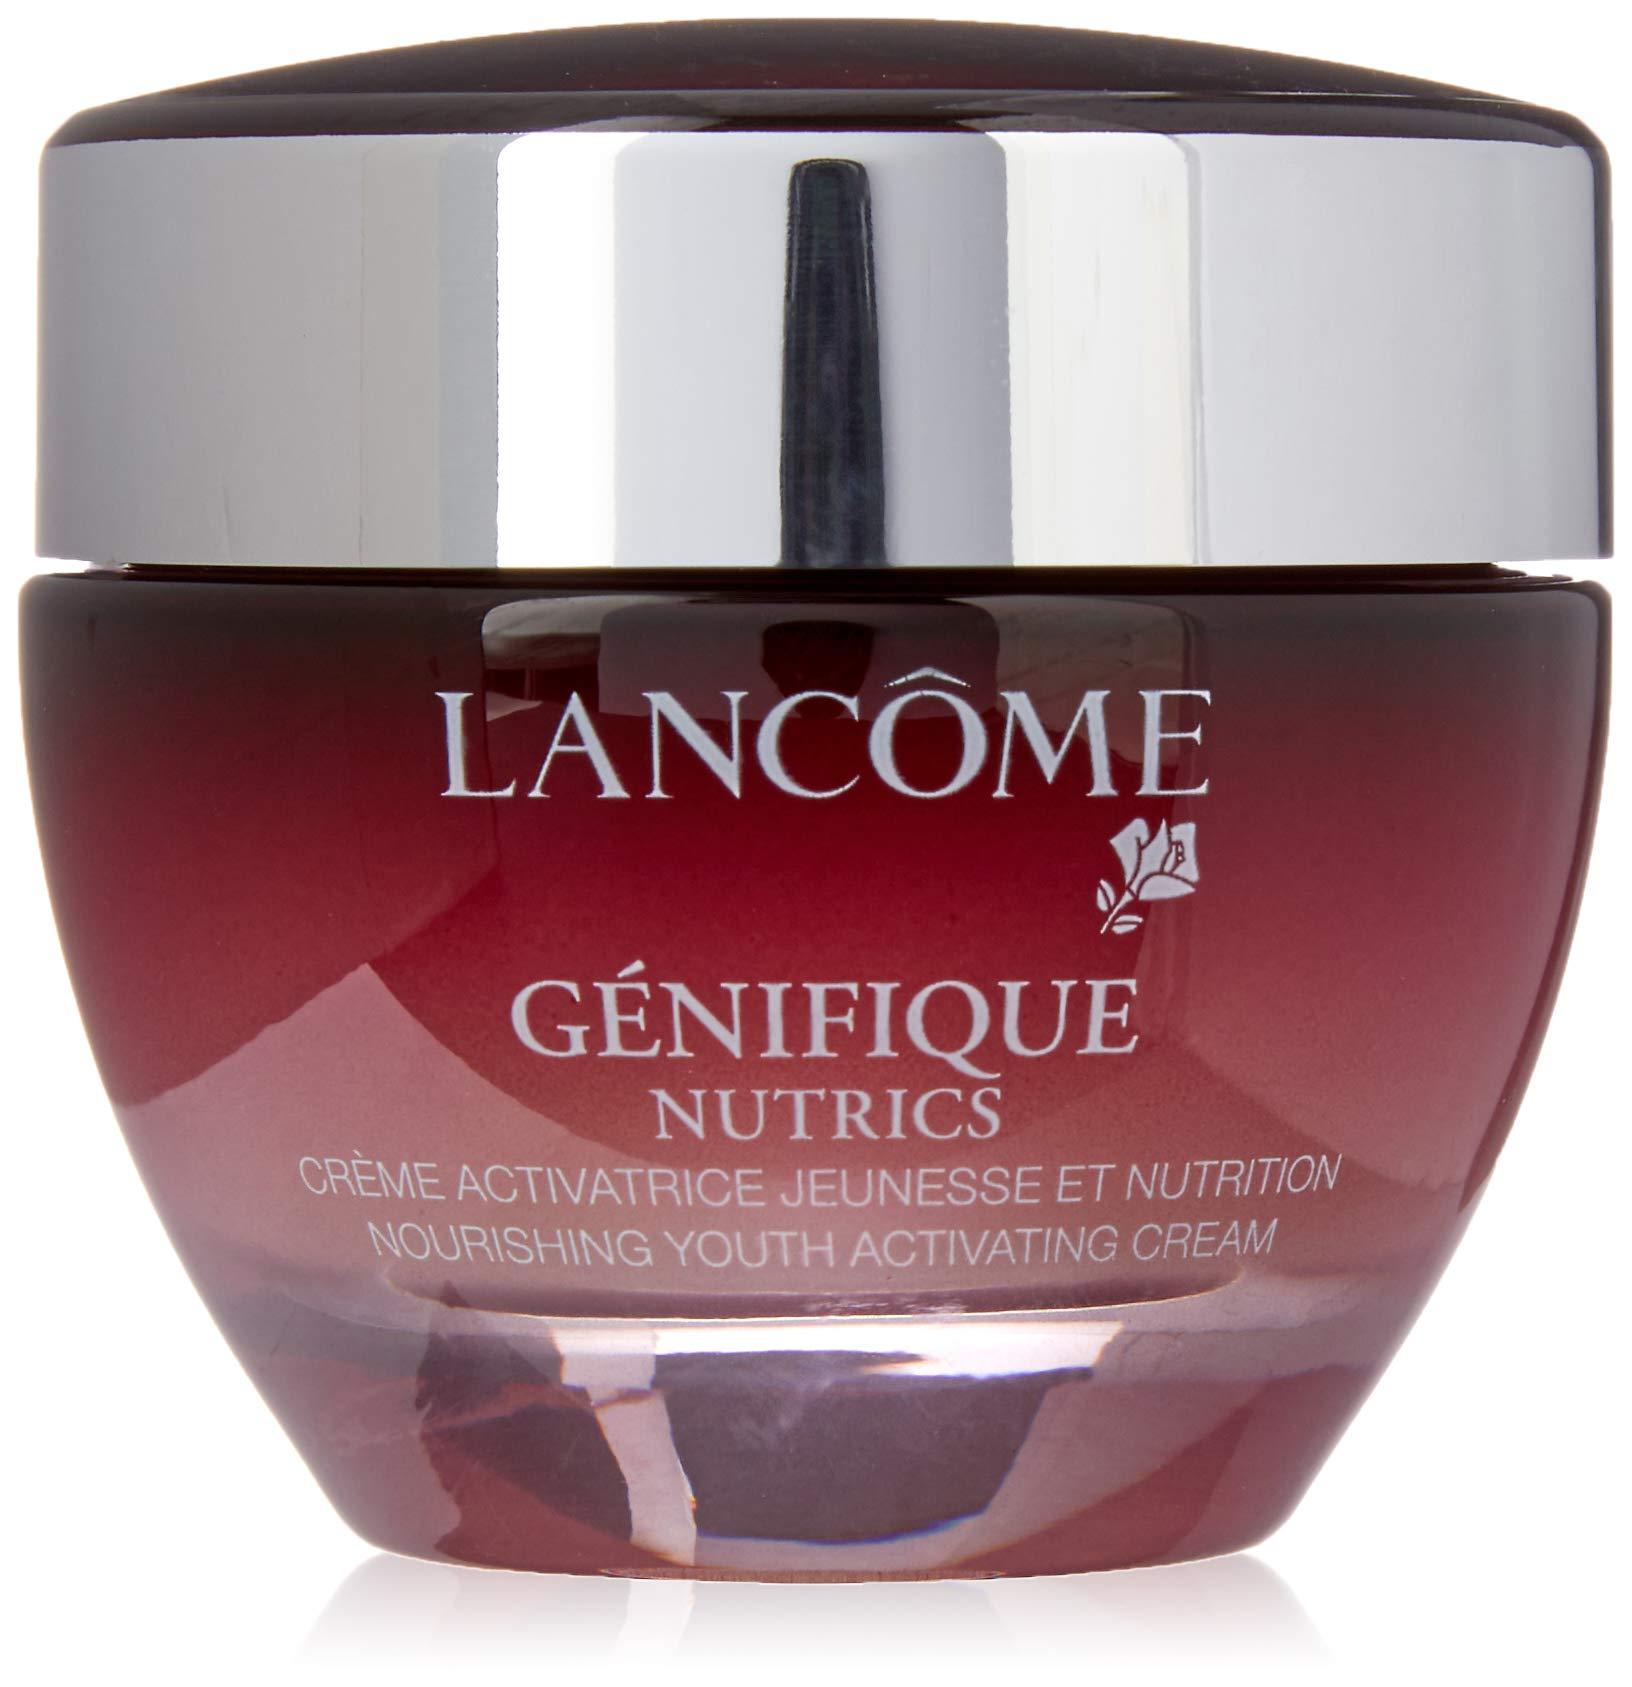 Lancome Genifique Nutrics Crema Ps 50 ml